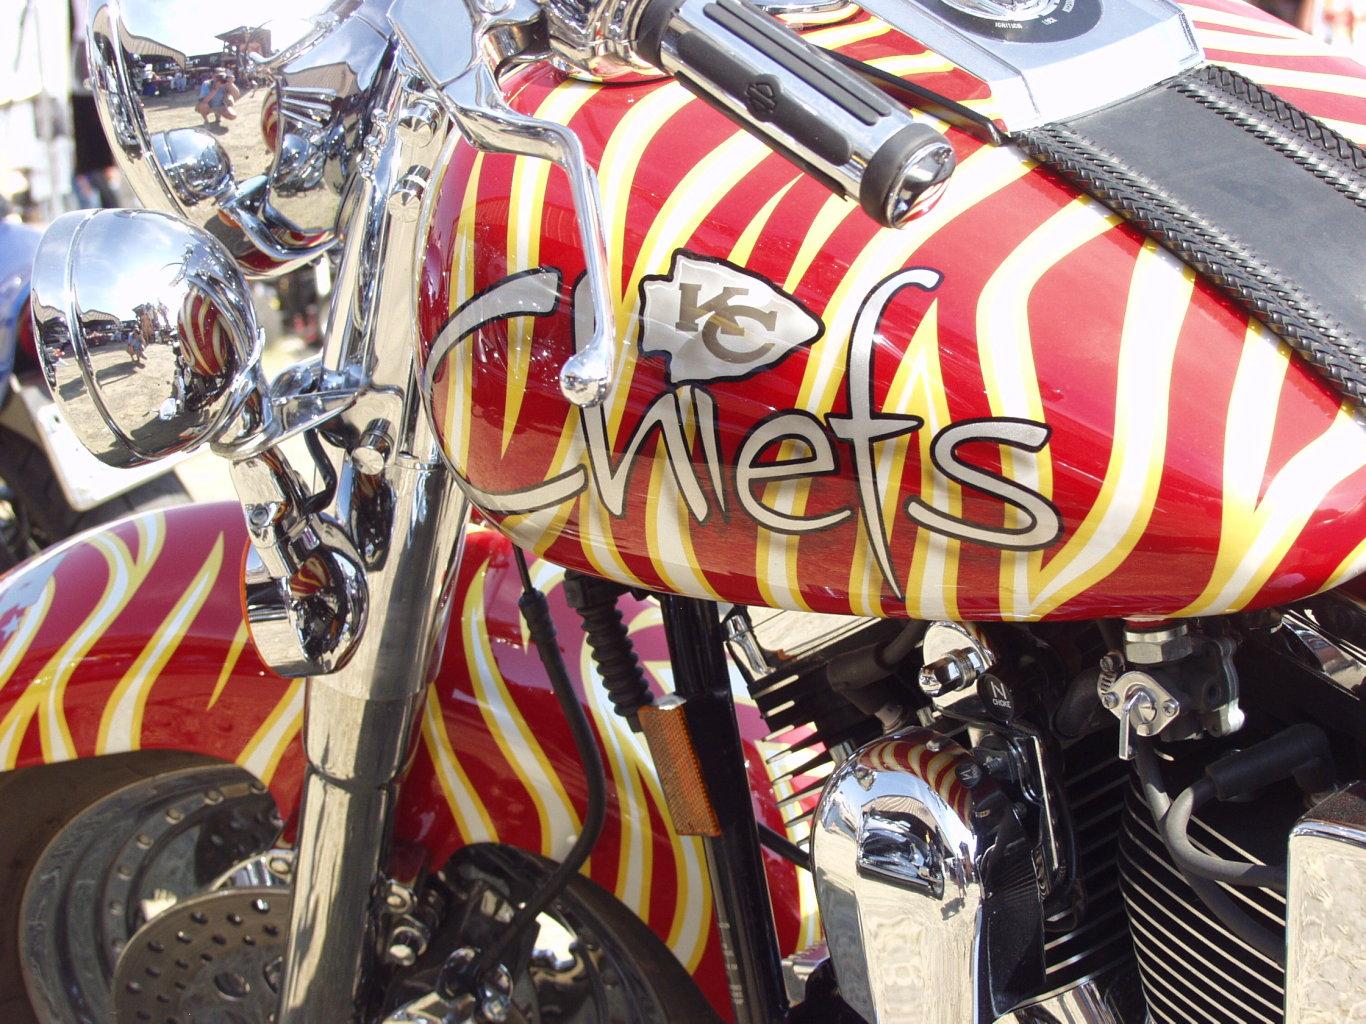 Chiefs gas tank